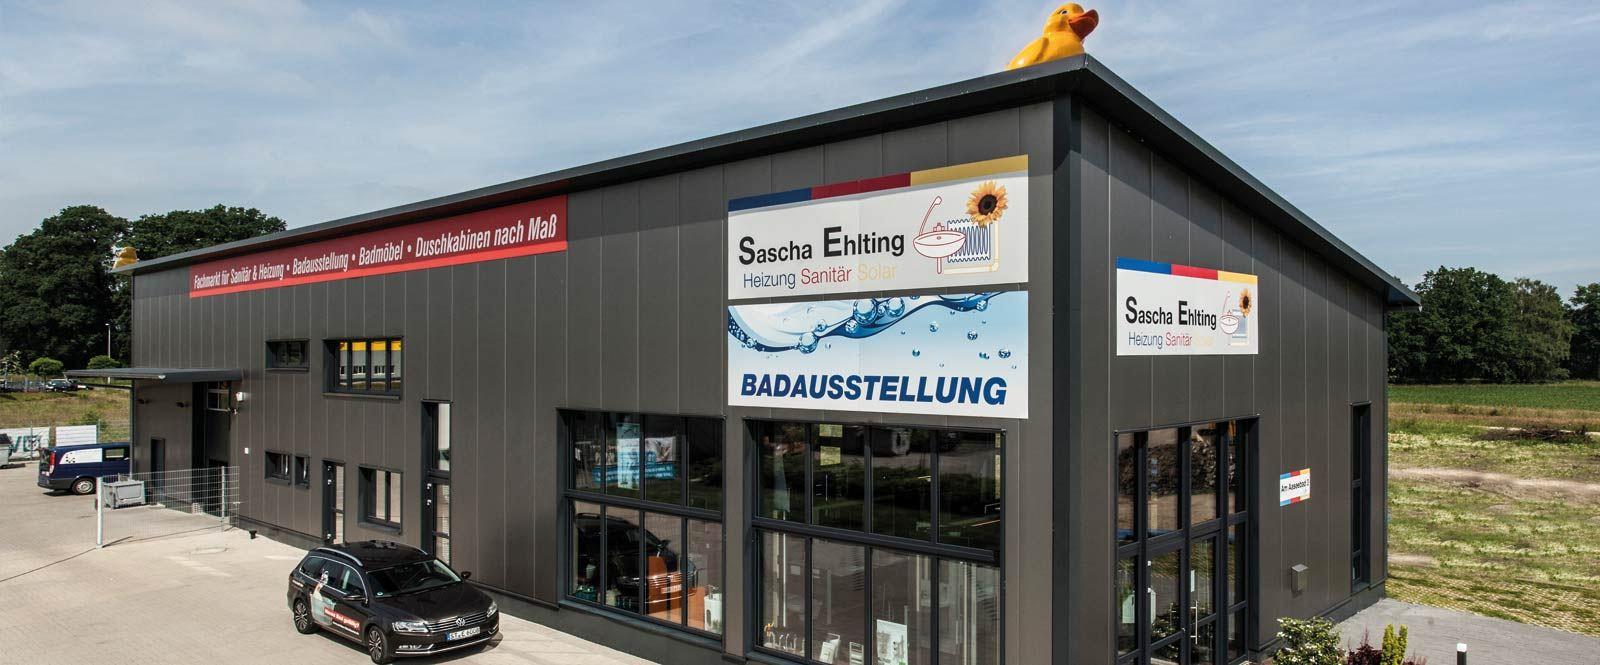 Heizung Ehlting Ibbenbüren Badausstellung